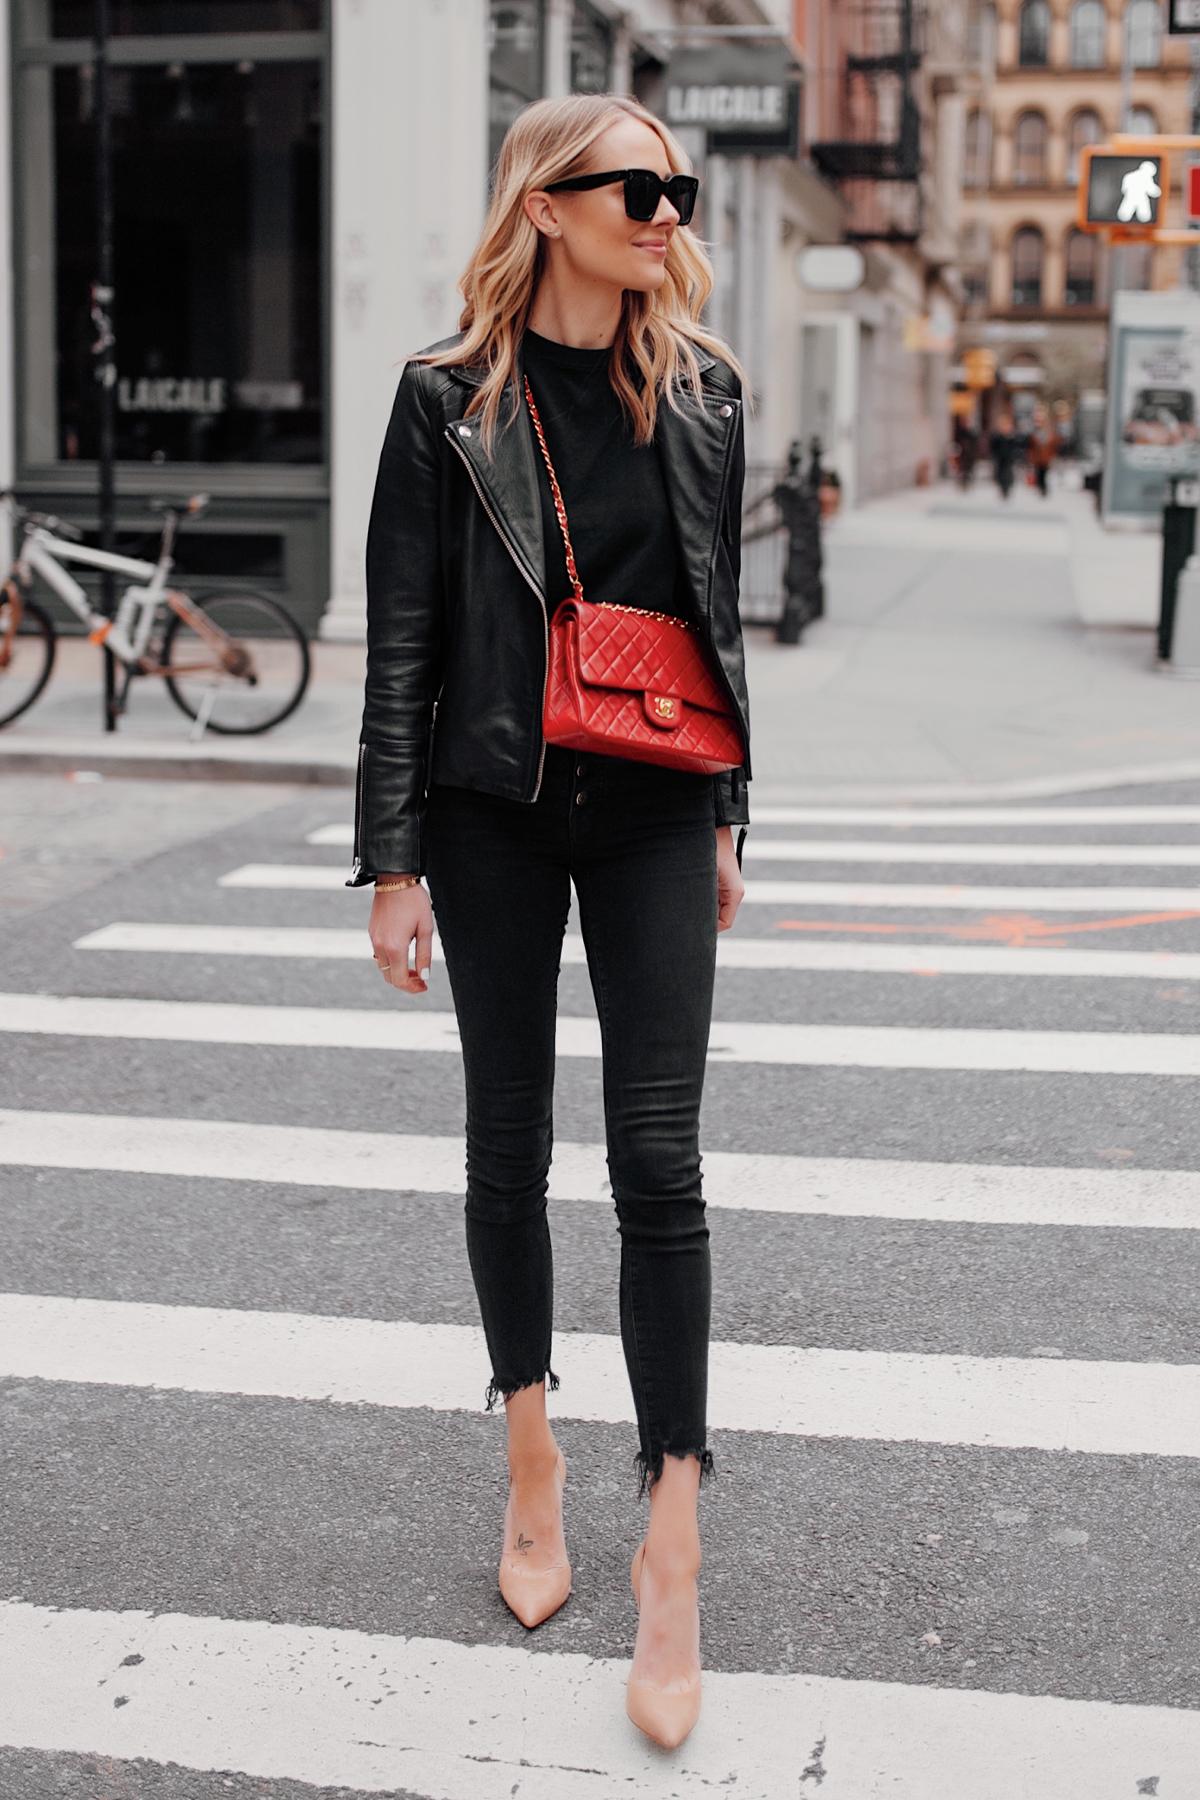 Fashion Jackson Wearing Black Leather Jacket Black Skinny Jeans Red Chanel Handbag Nude Pumps NYC Street Style 2